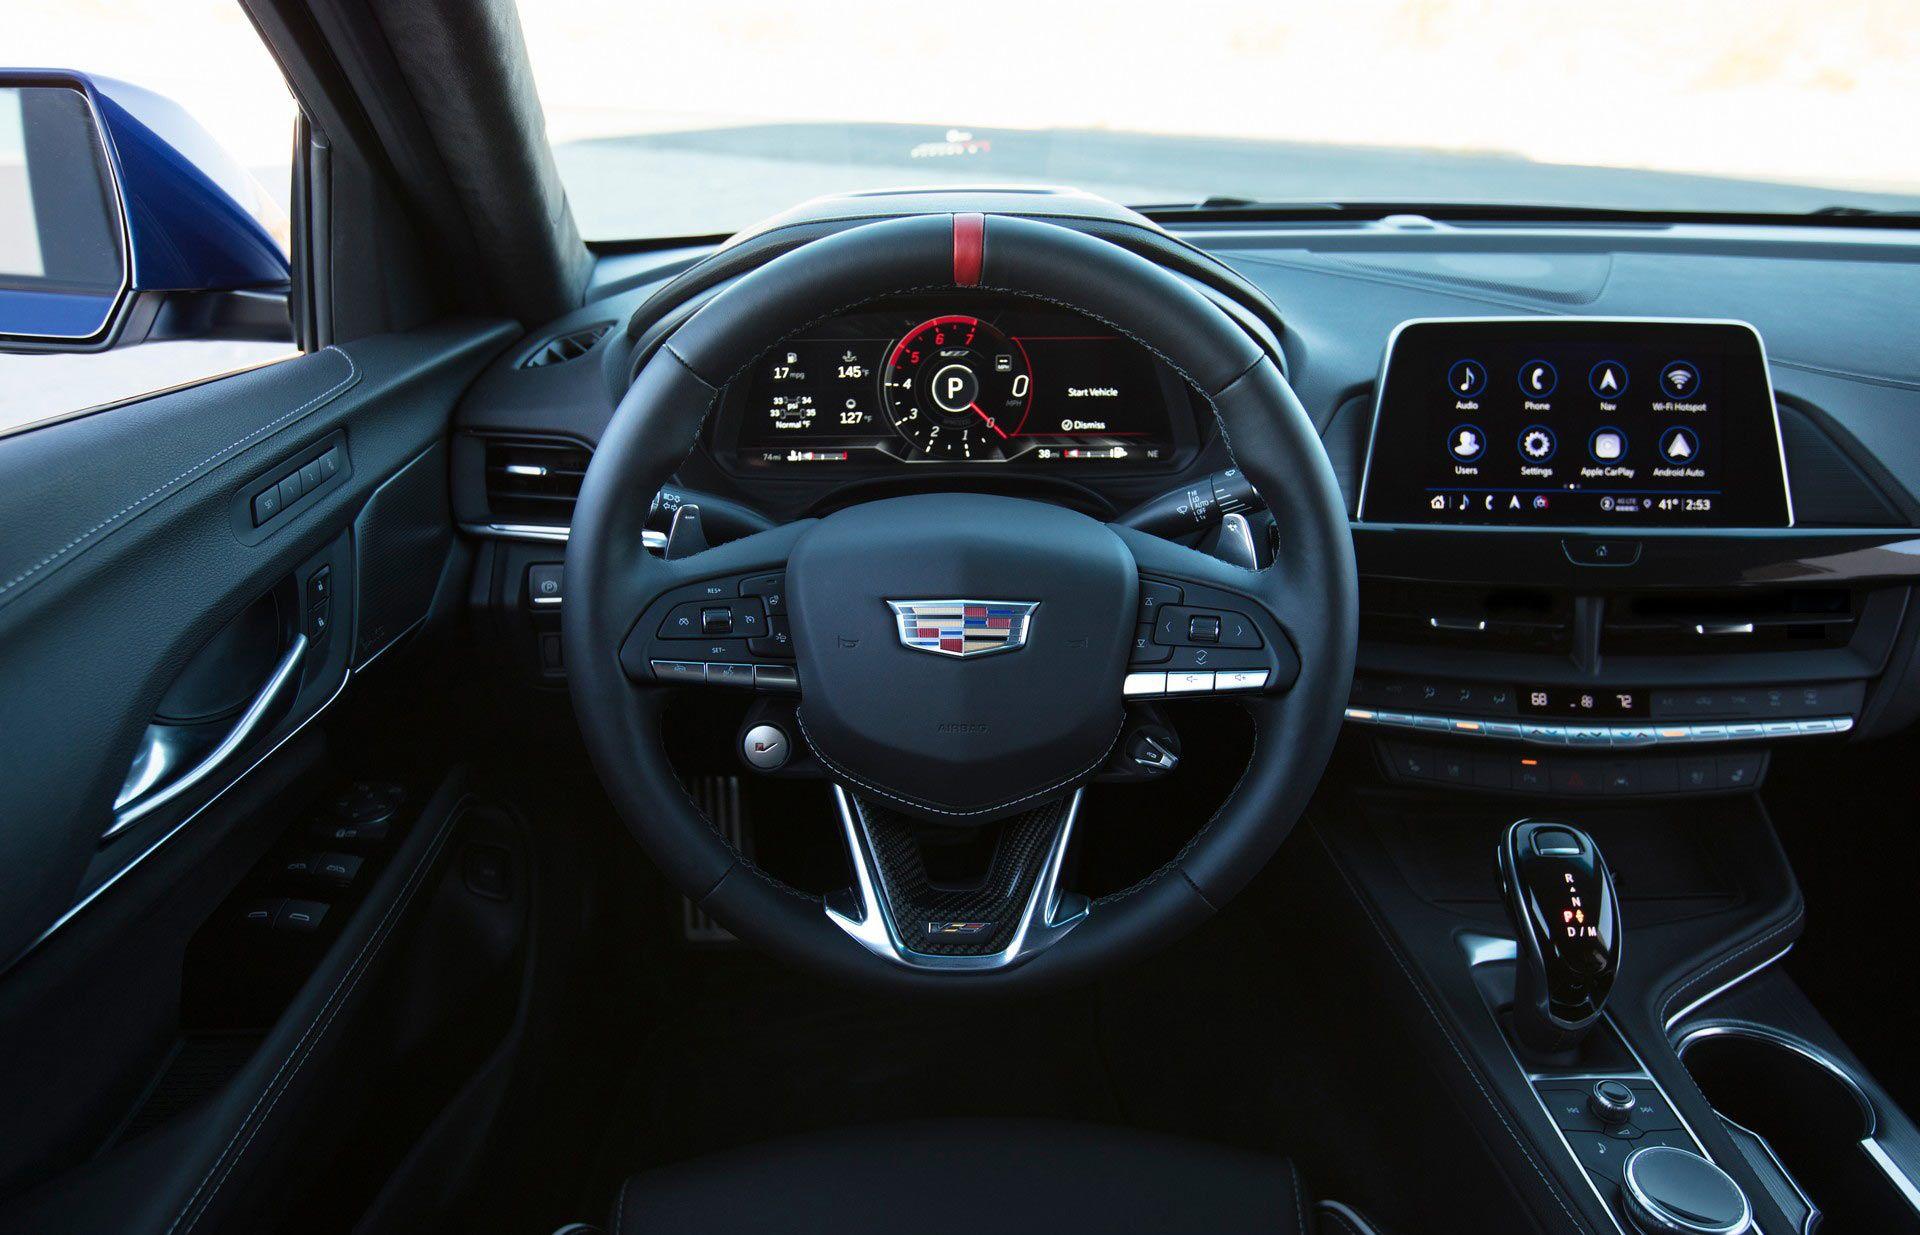 2022-Cadillac-CT4-V-Blackwi